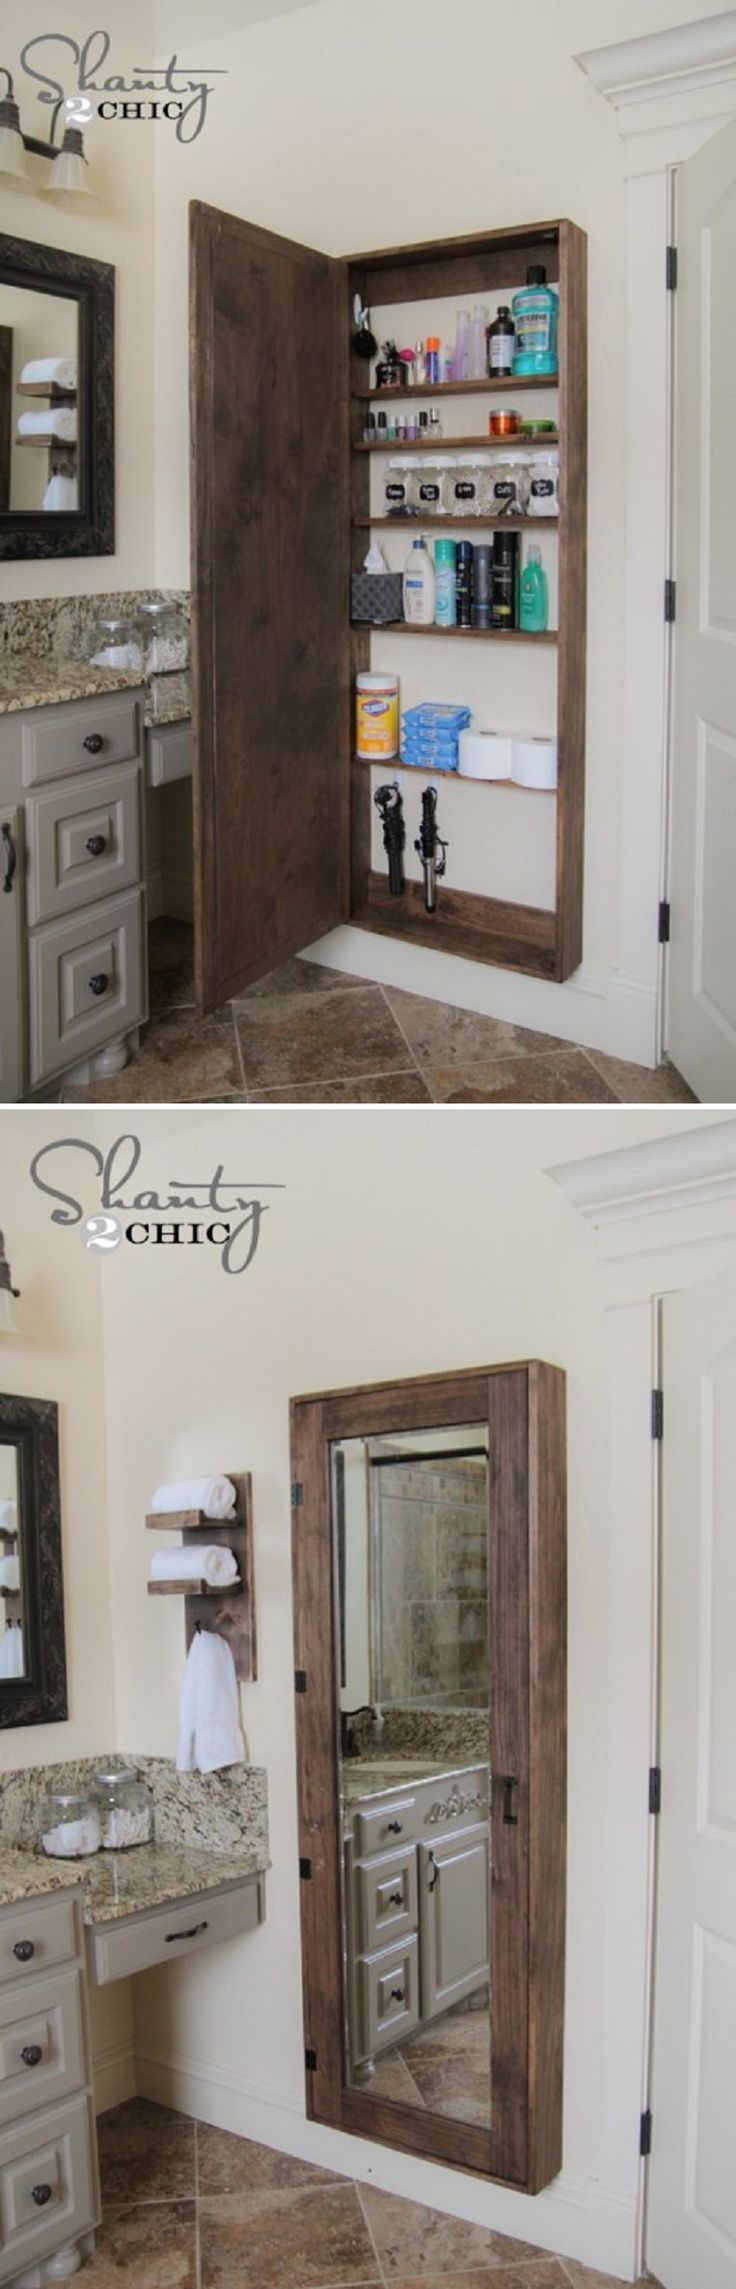 DIY Bathroom mirror storage case that holds everything. - 17 Repurposed DIY Bathroom Storage Solutions   GleamItUp